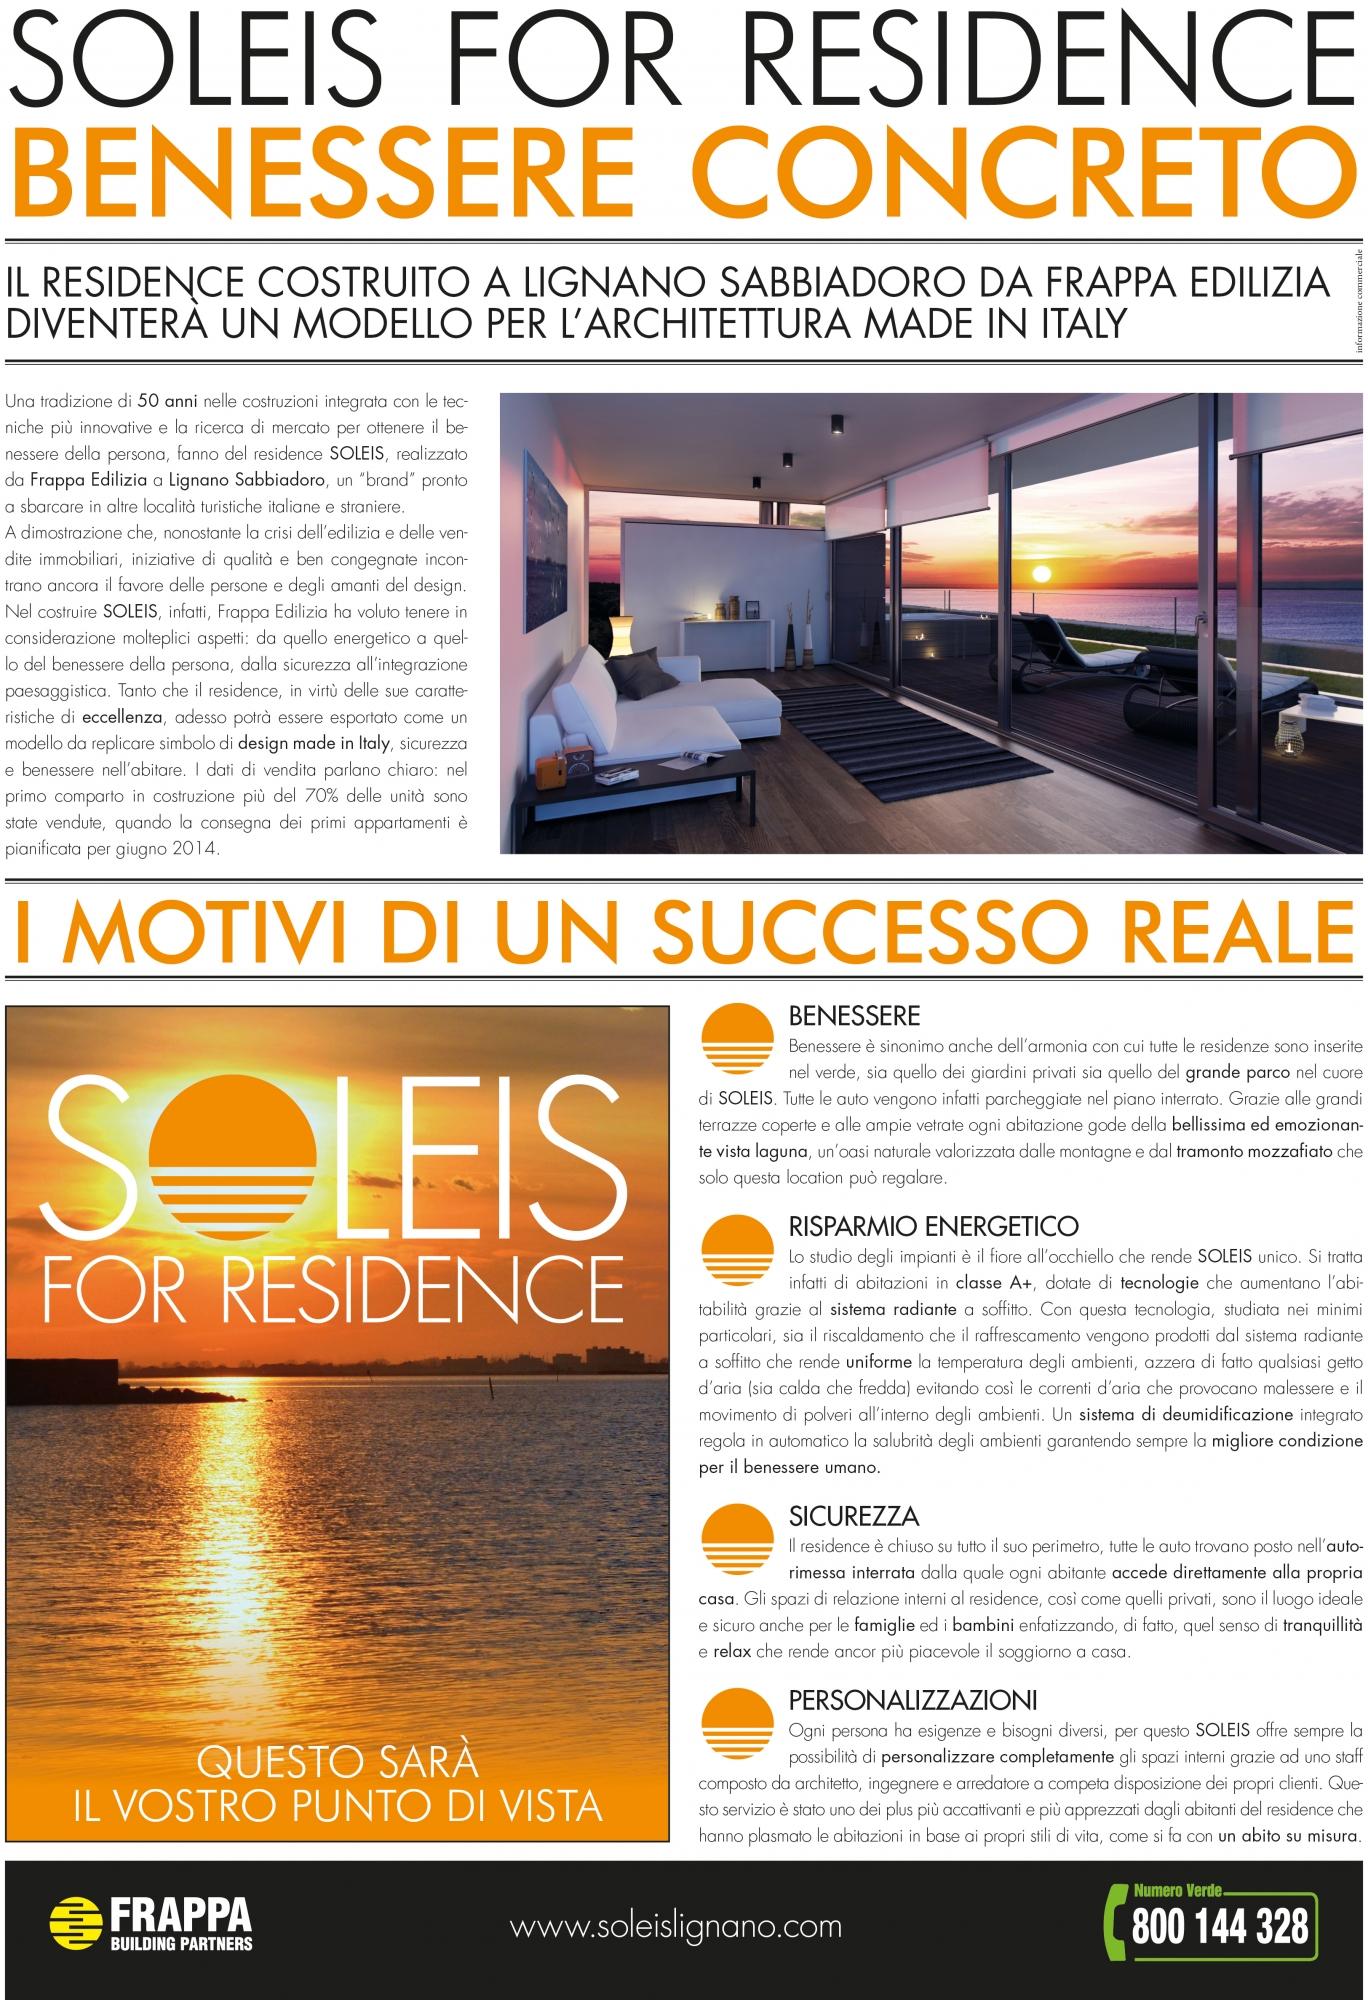 News Soleis For Residence Ville Appartamenti Attici